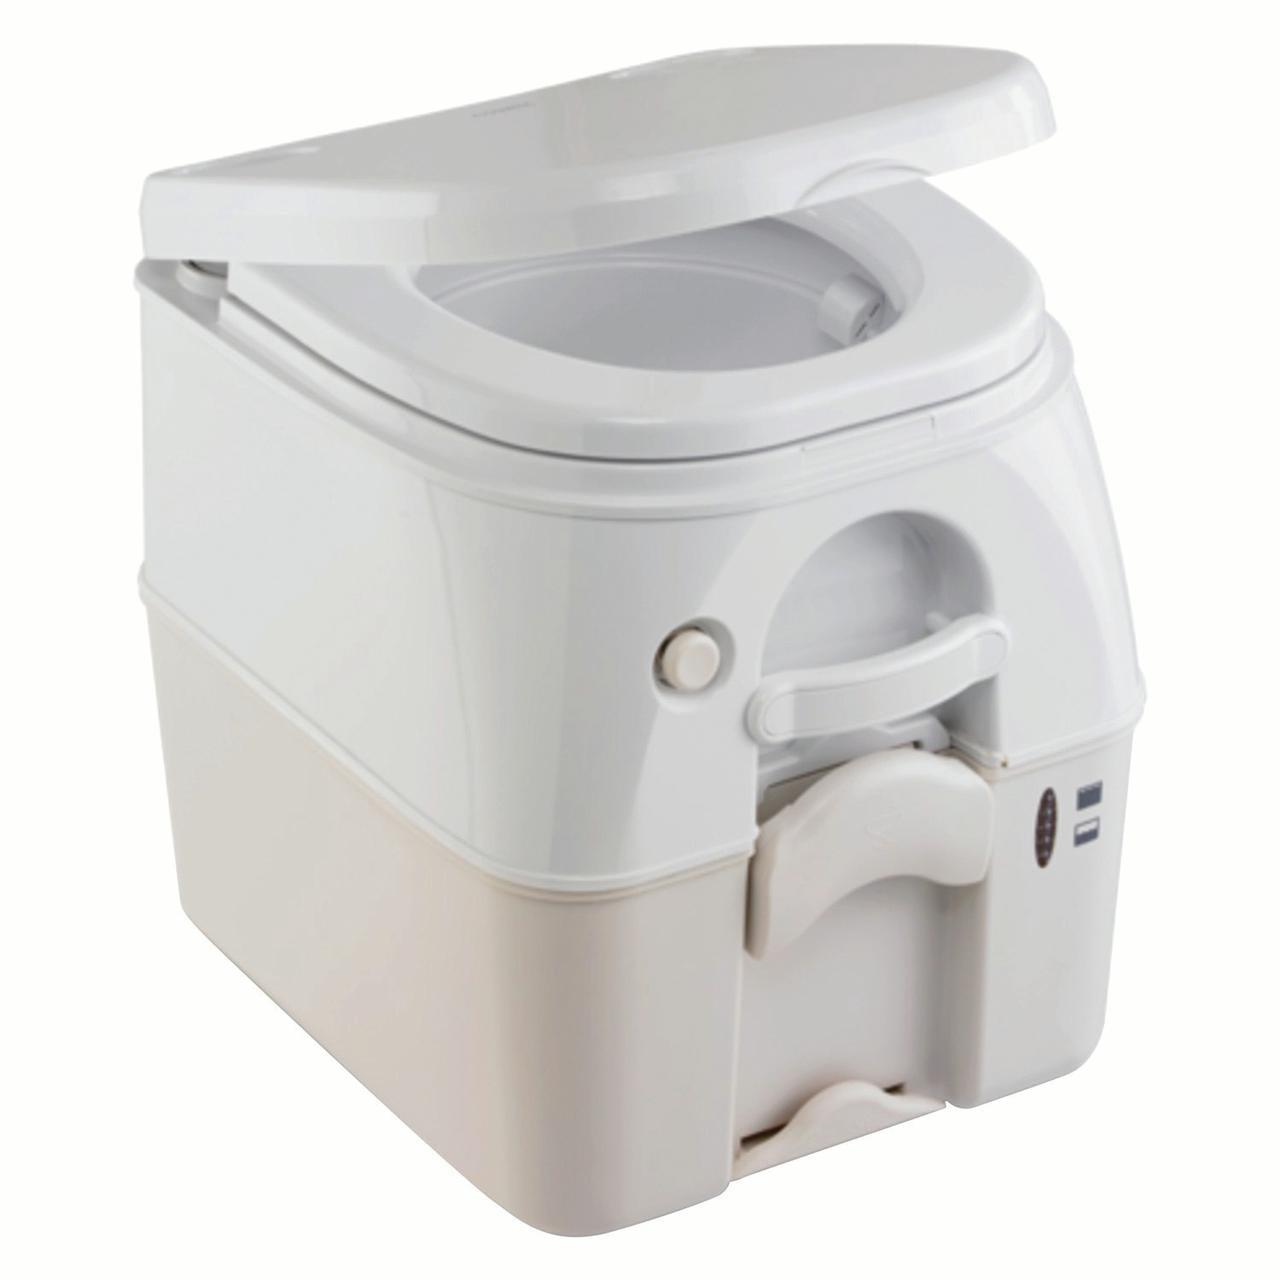 Dometic 301097202 970 Series Portable Toilet - 2.6 Gallon, Tan